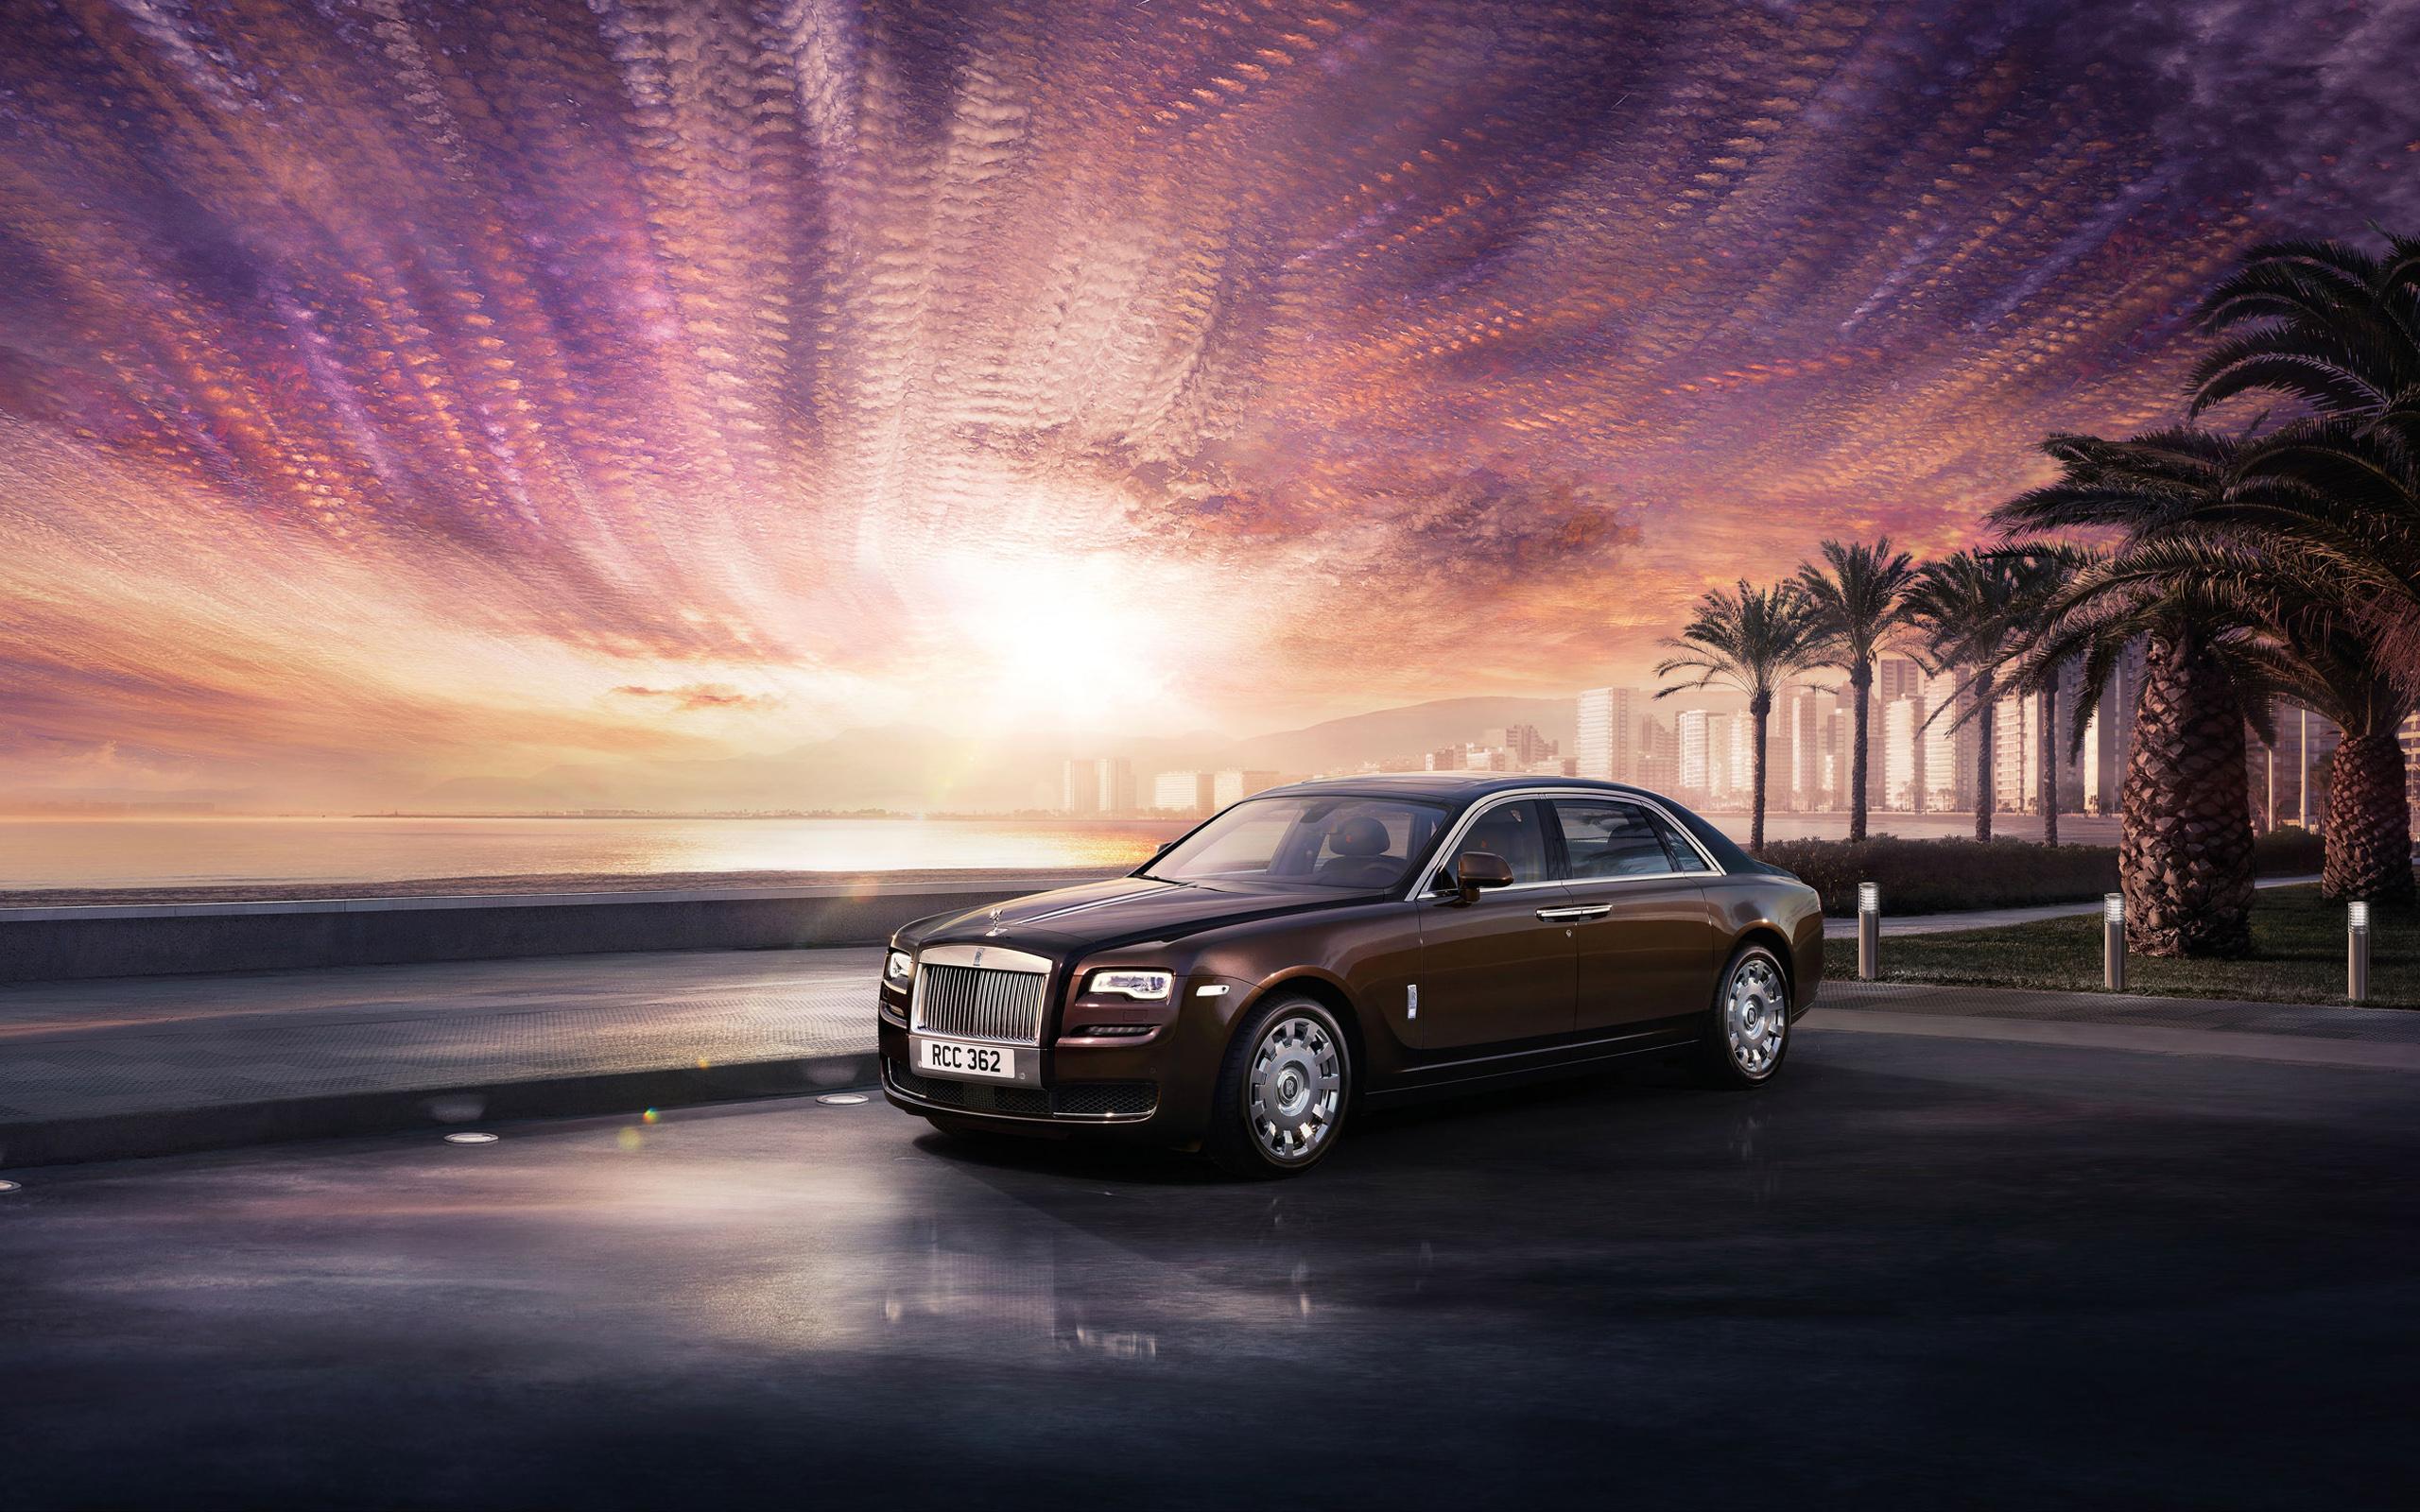 Rolls Royce Ghost Series II 2015 Wallpapers HD Wallpapers 2560x1600